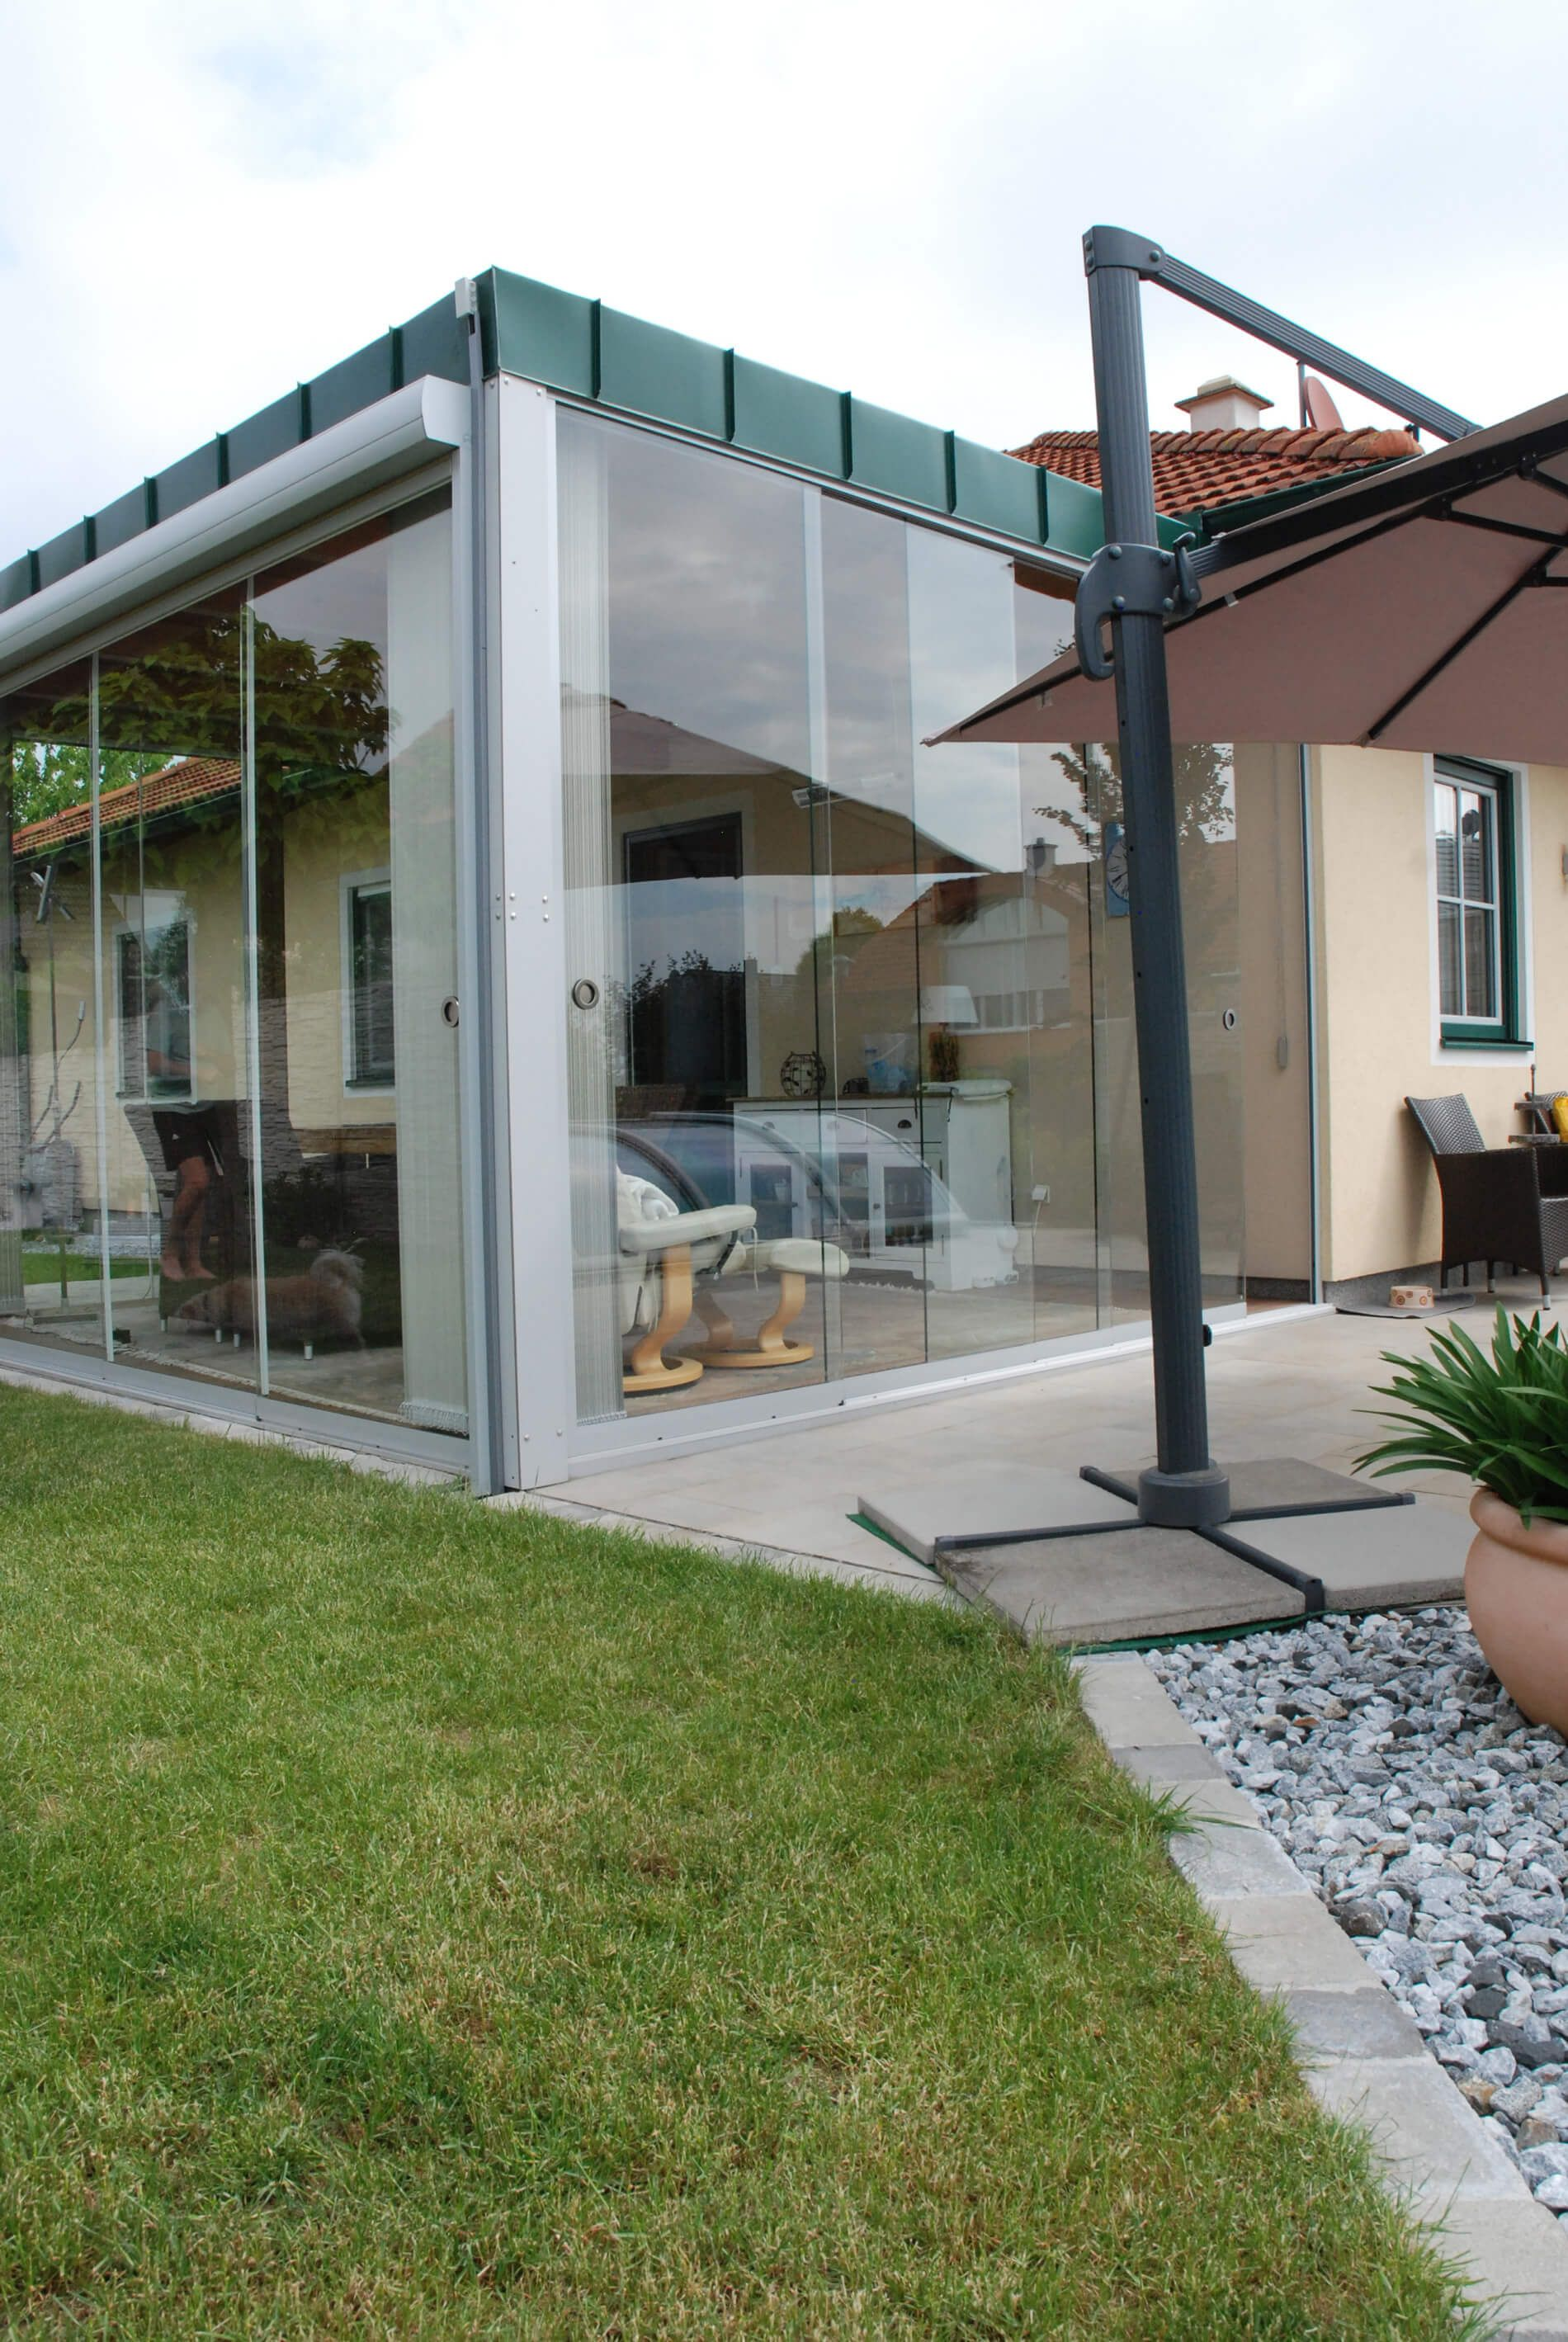 Wintergarten Anbau Glasschiebeturen Balkonverglasung